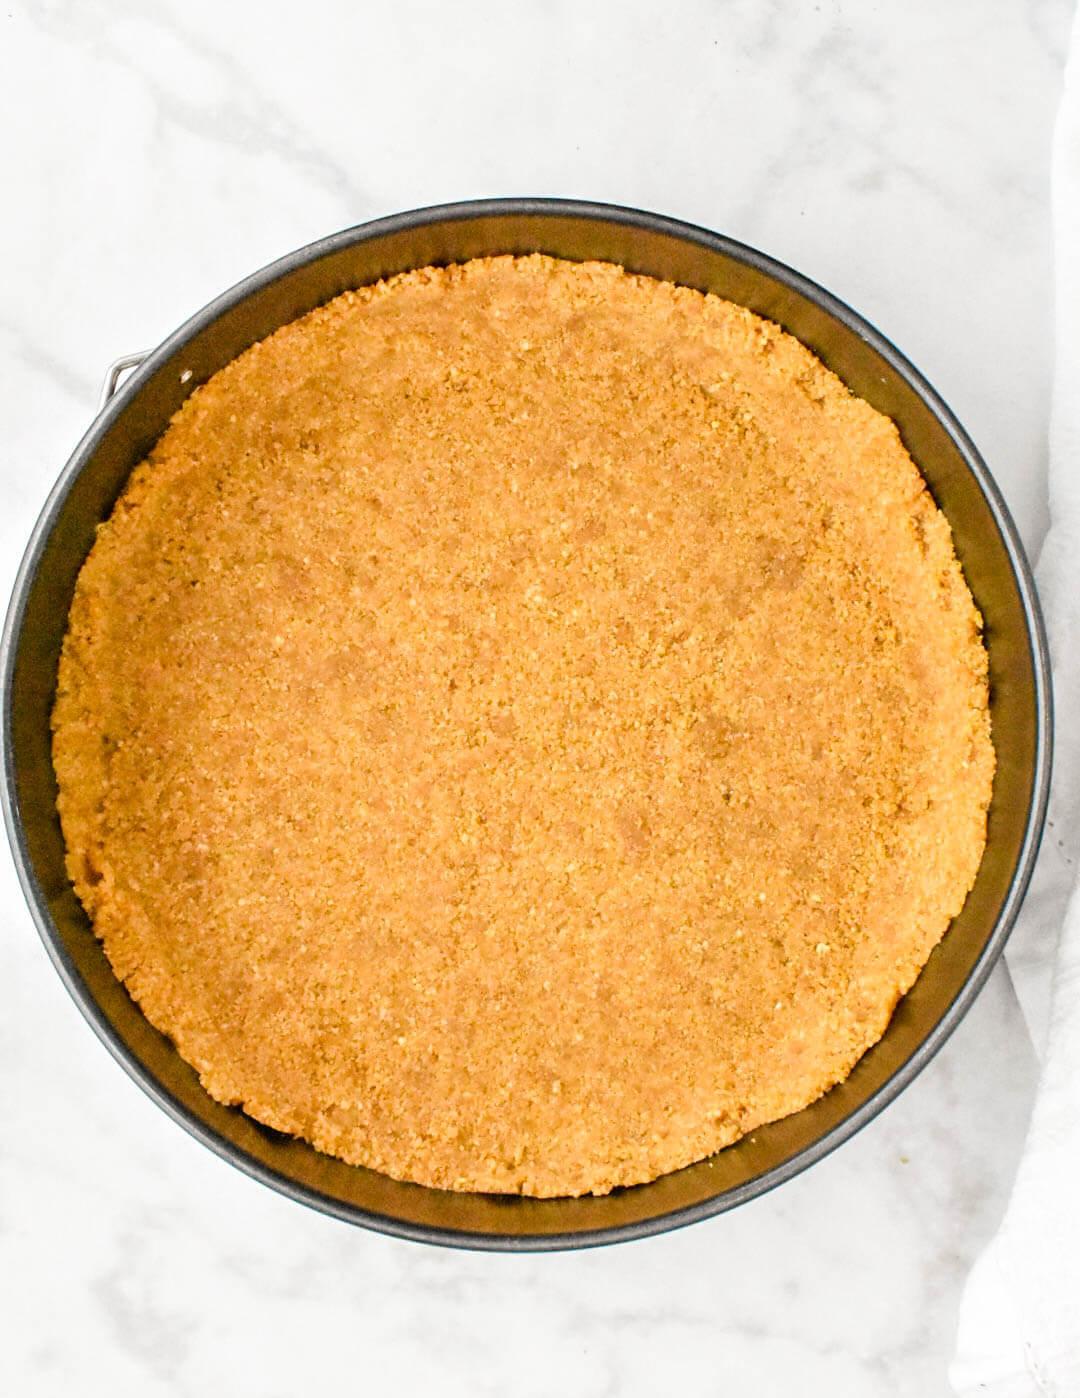 Graham crust pressed into springform pan